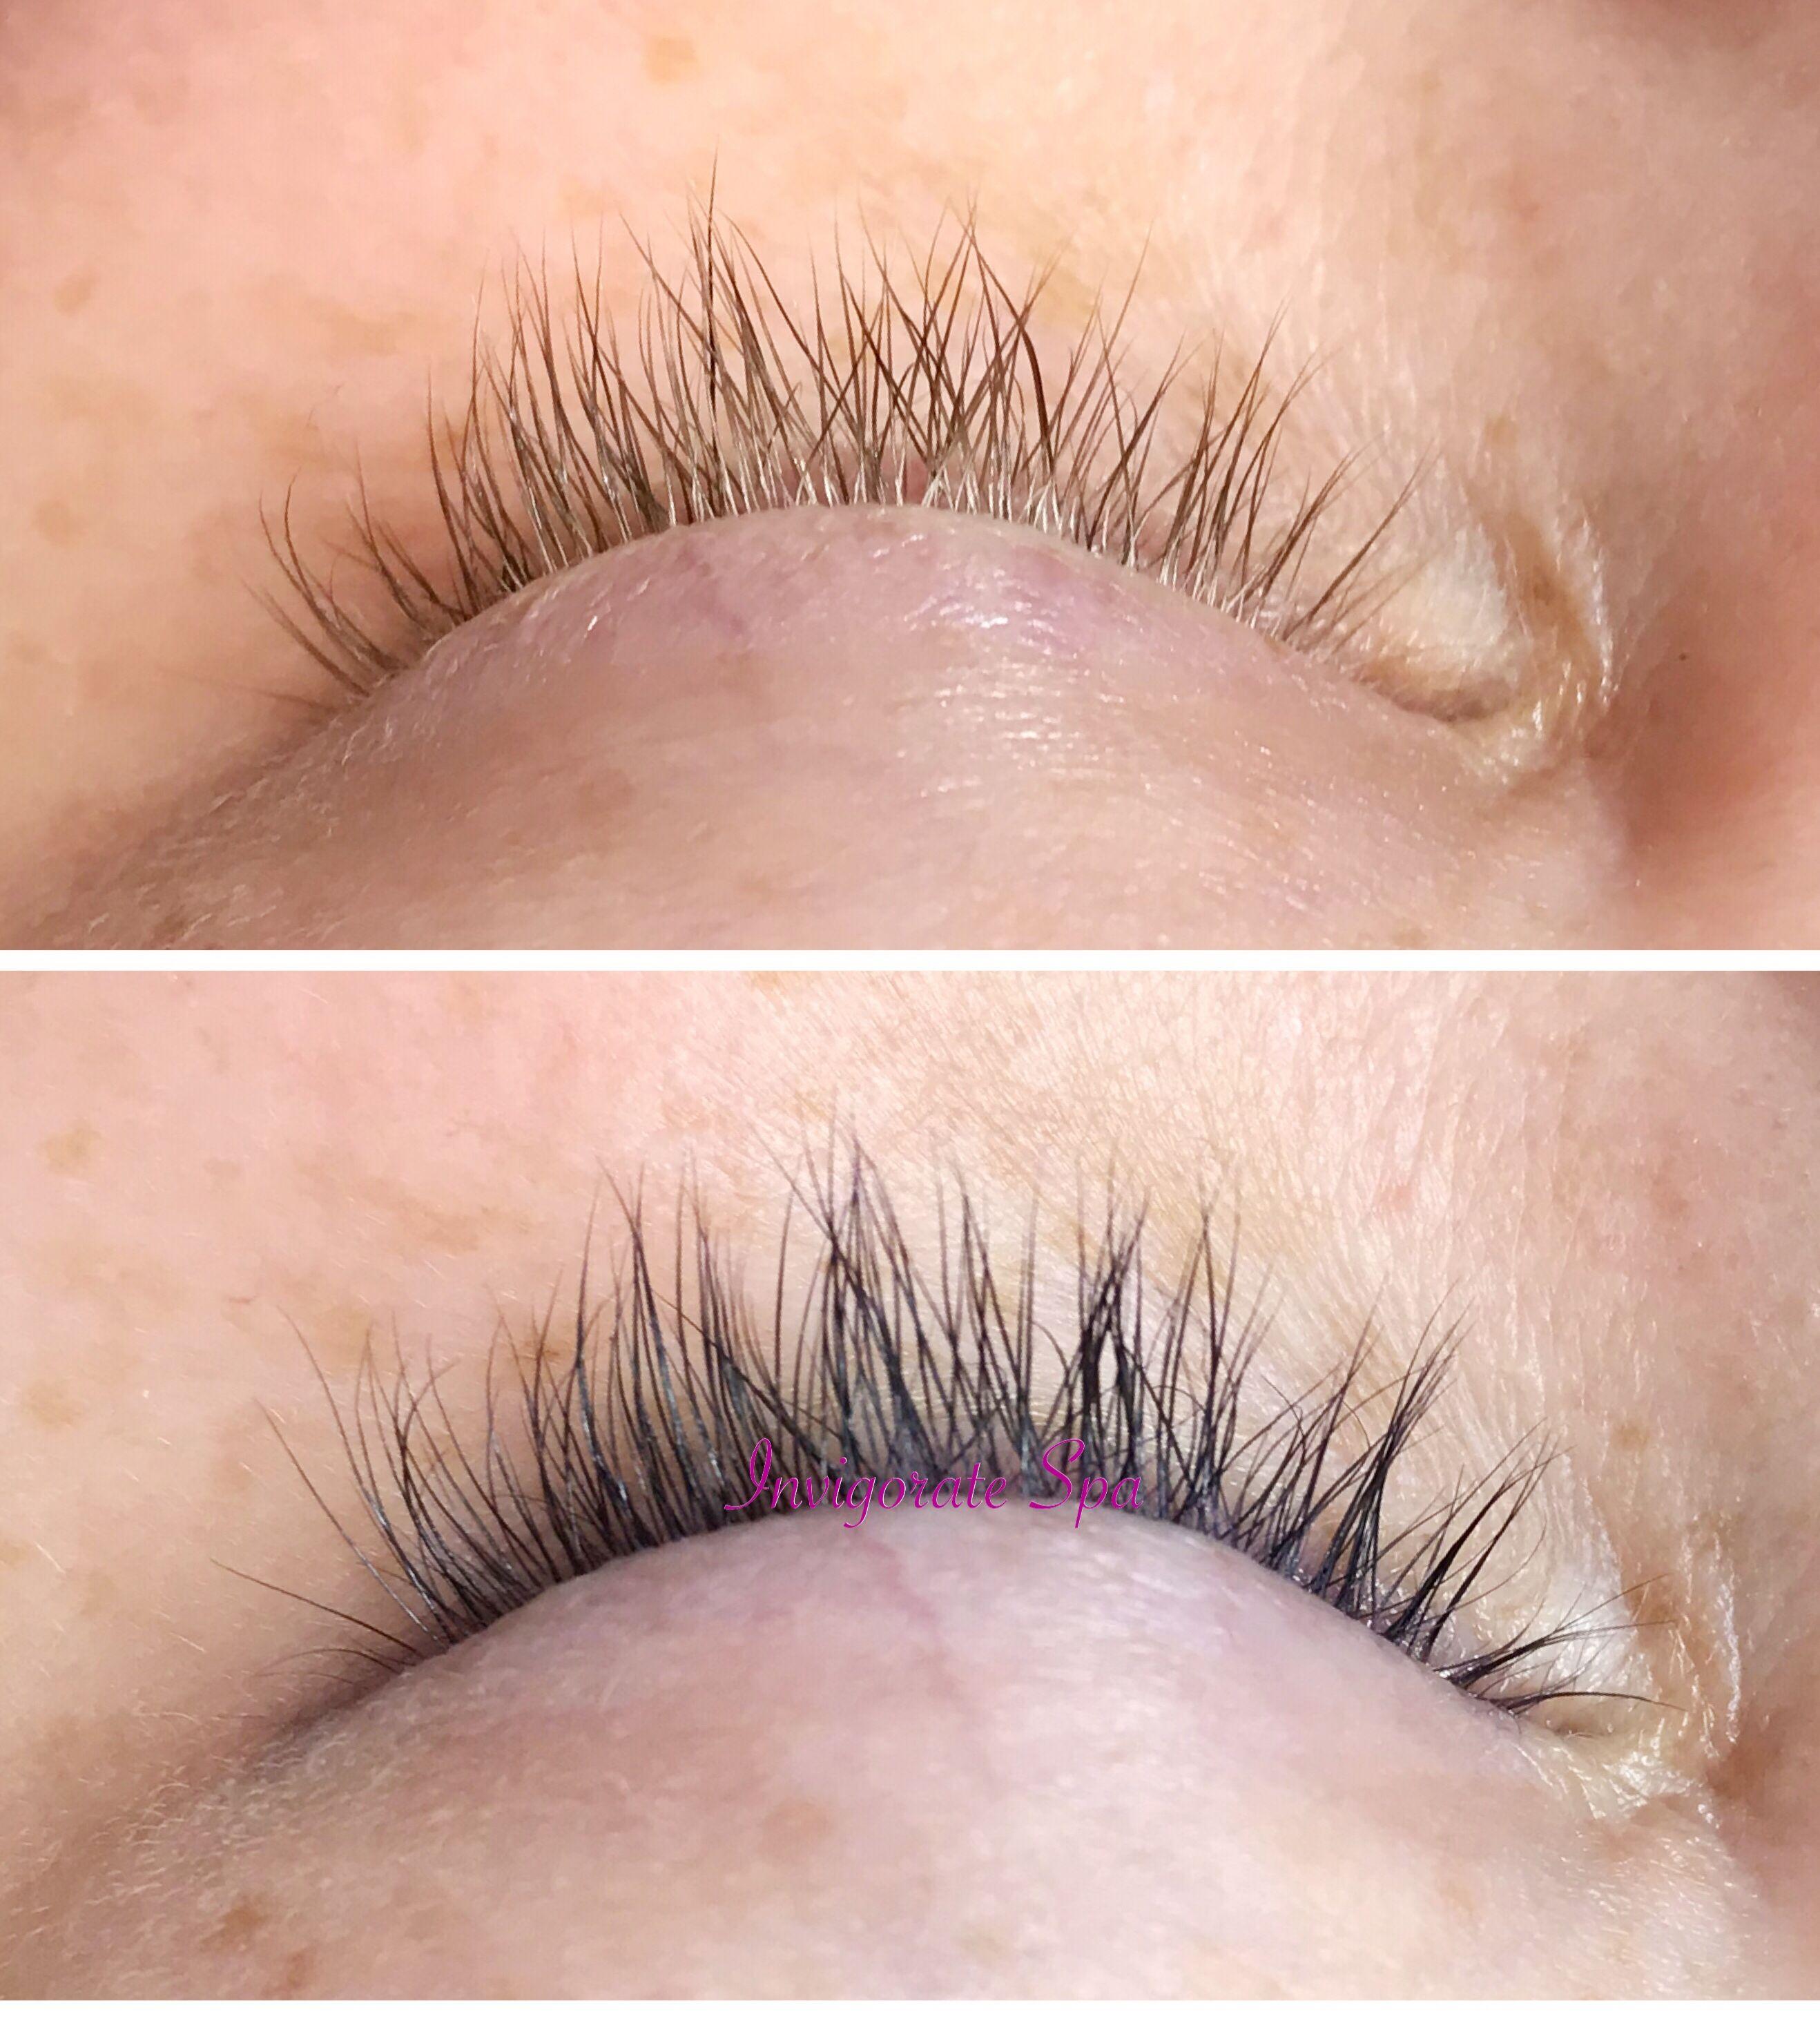 Pin by Invigorate Spa on Eyelash and eyebrow tinting in 2019 | Semi ...